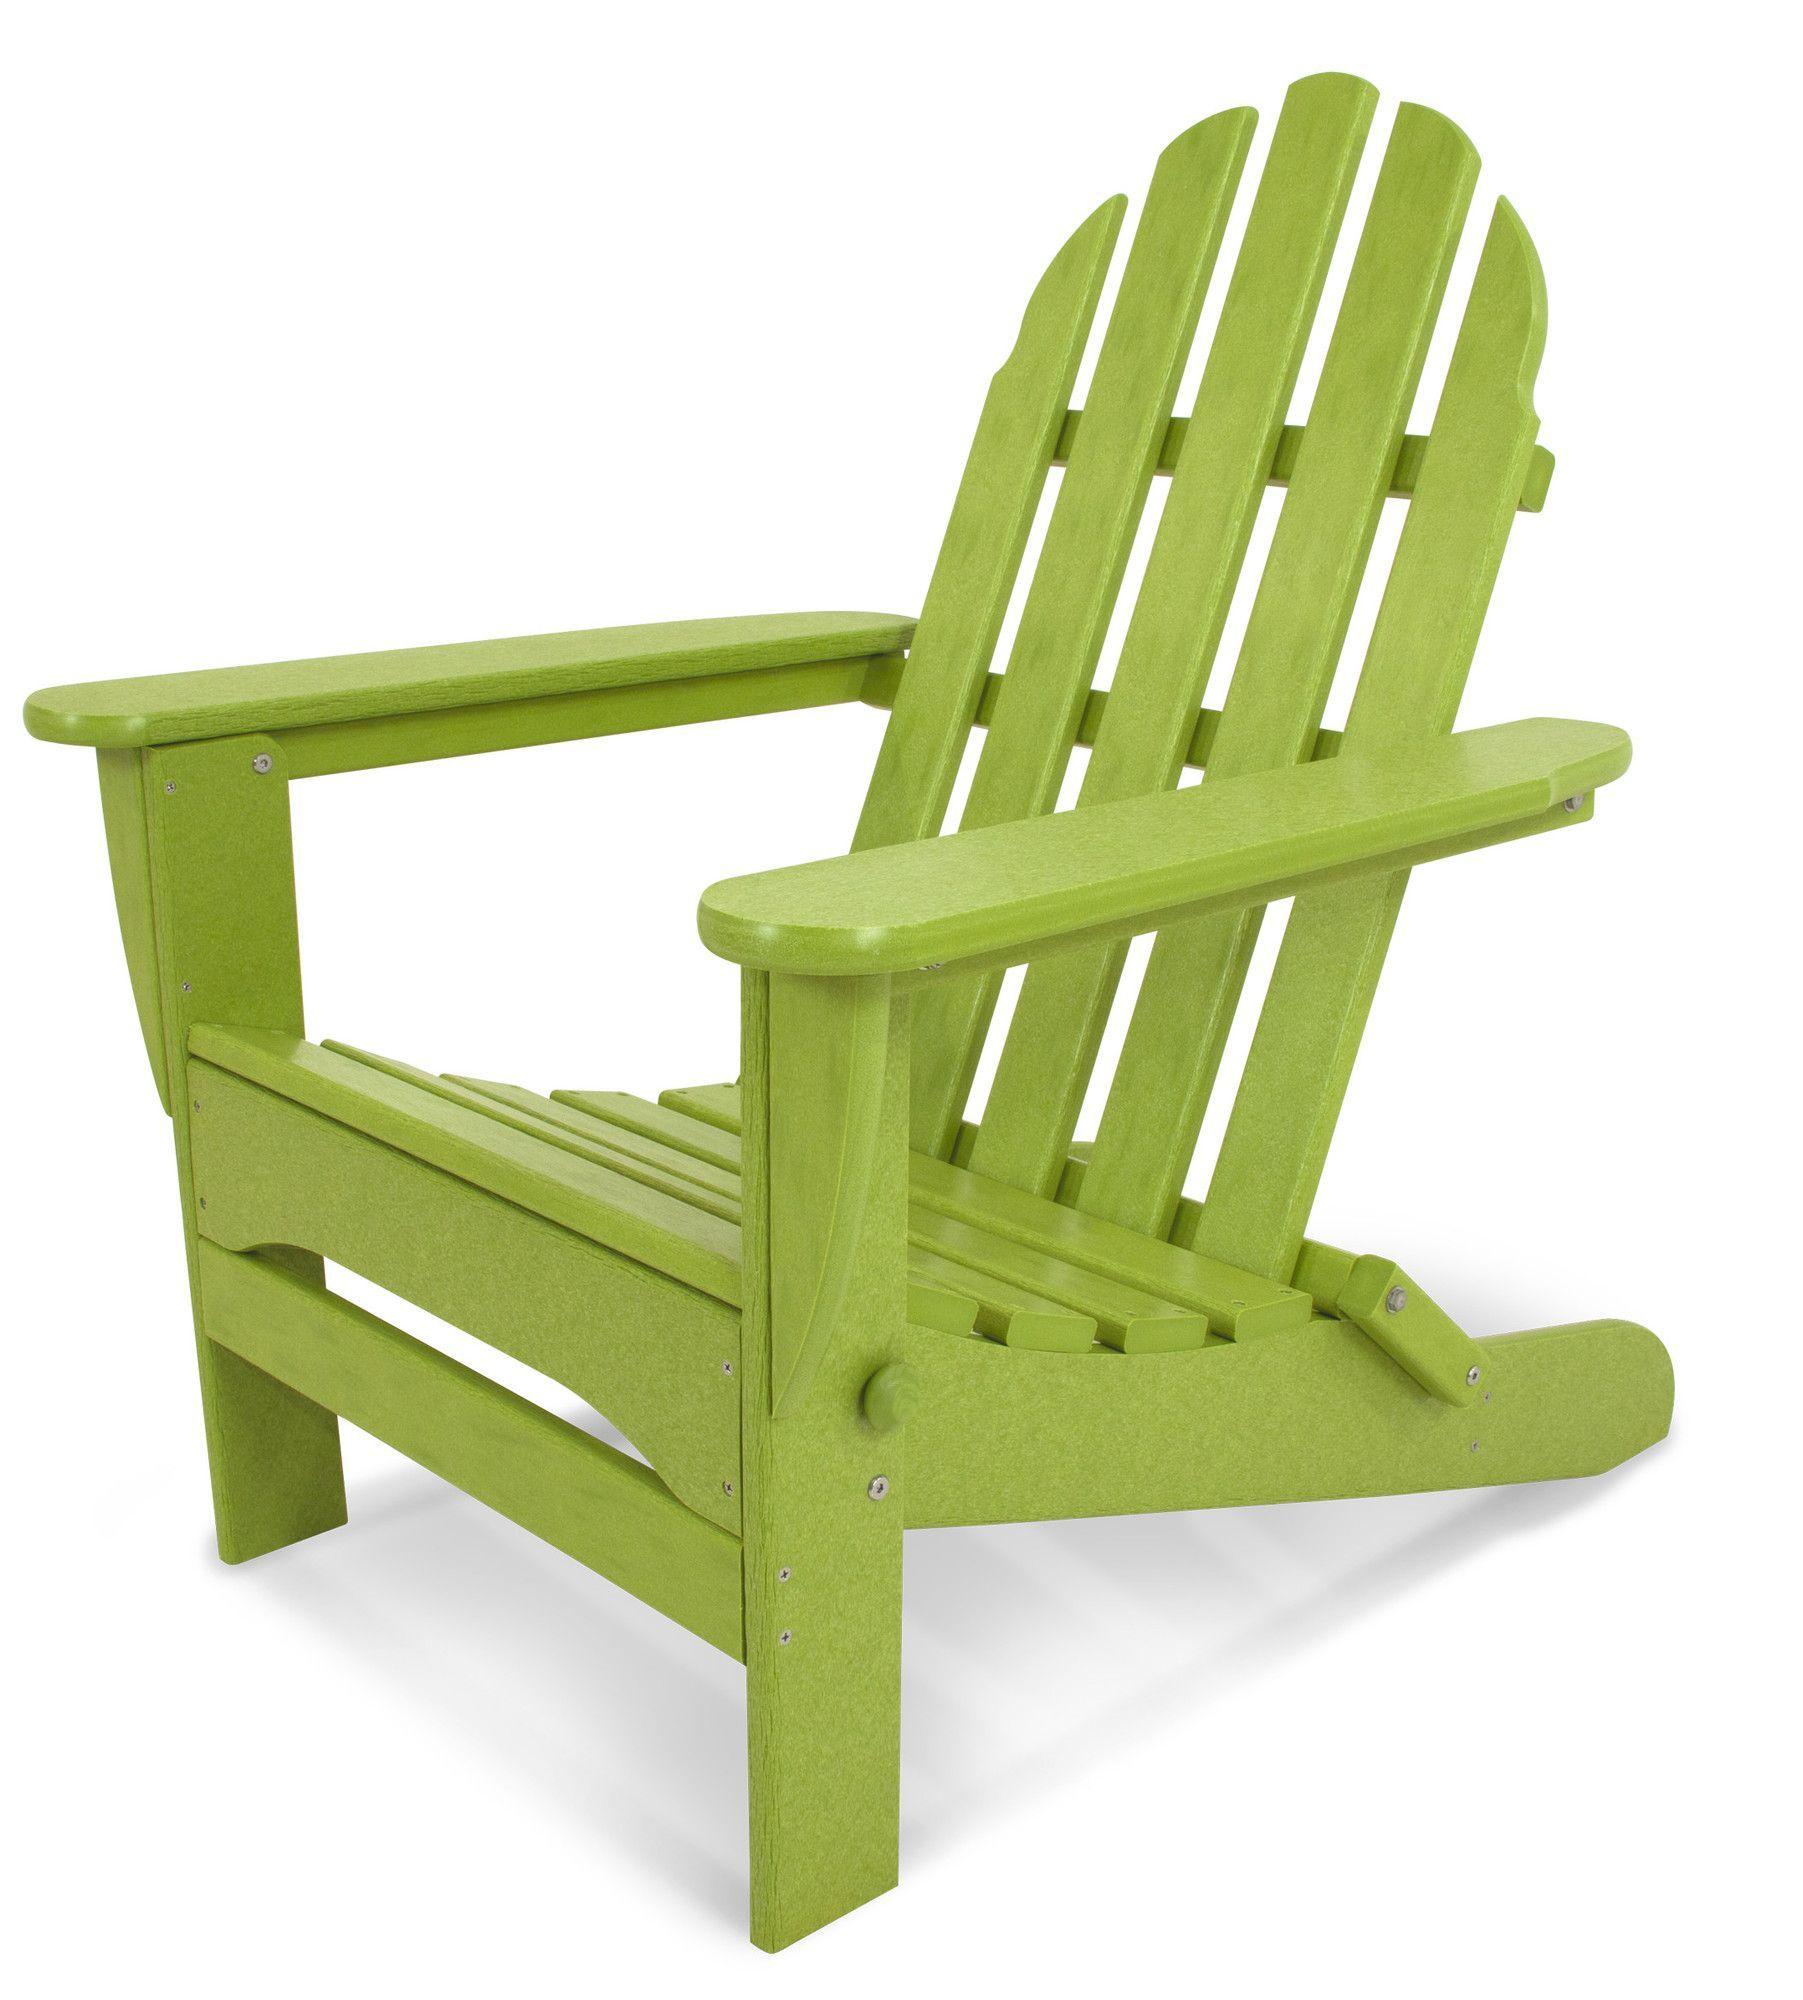 Classic Plastic Adirondack Folding Chair Plastic Adirondack